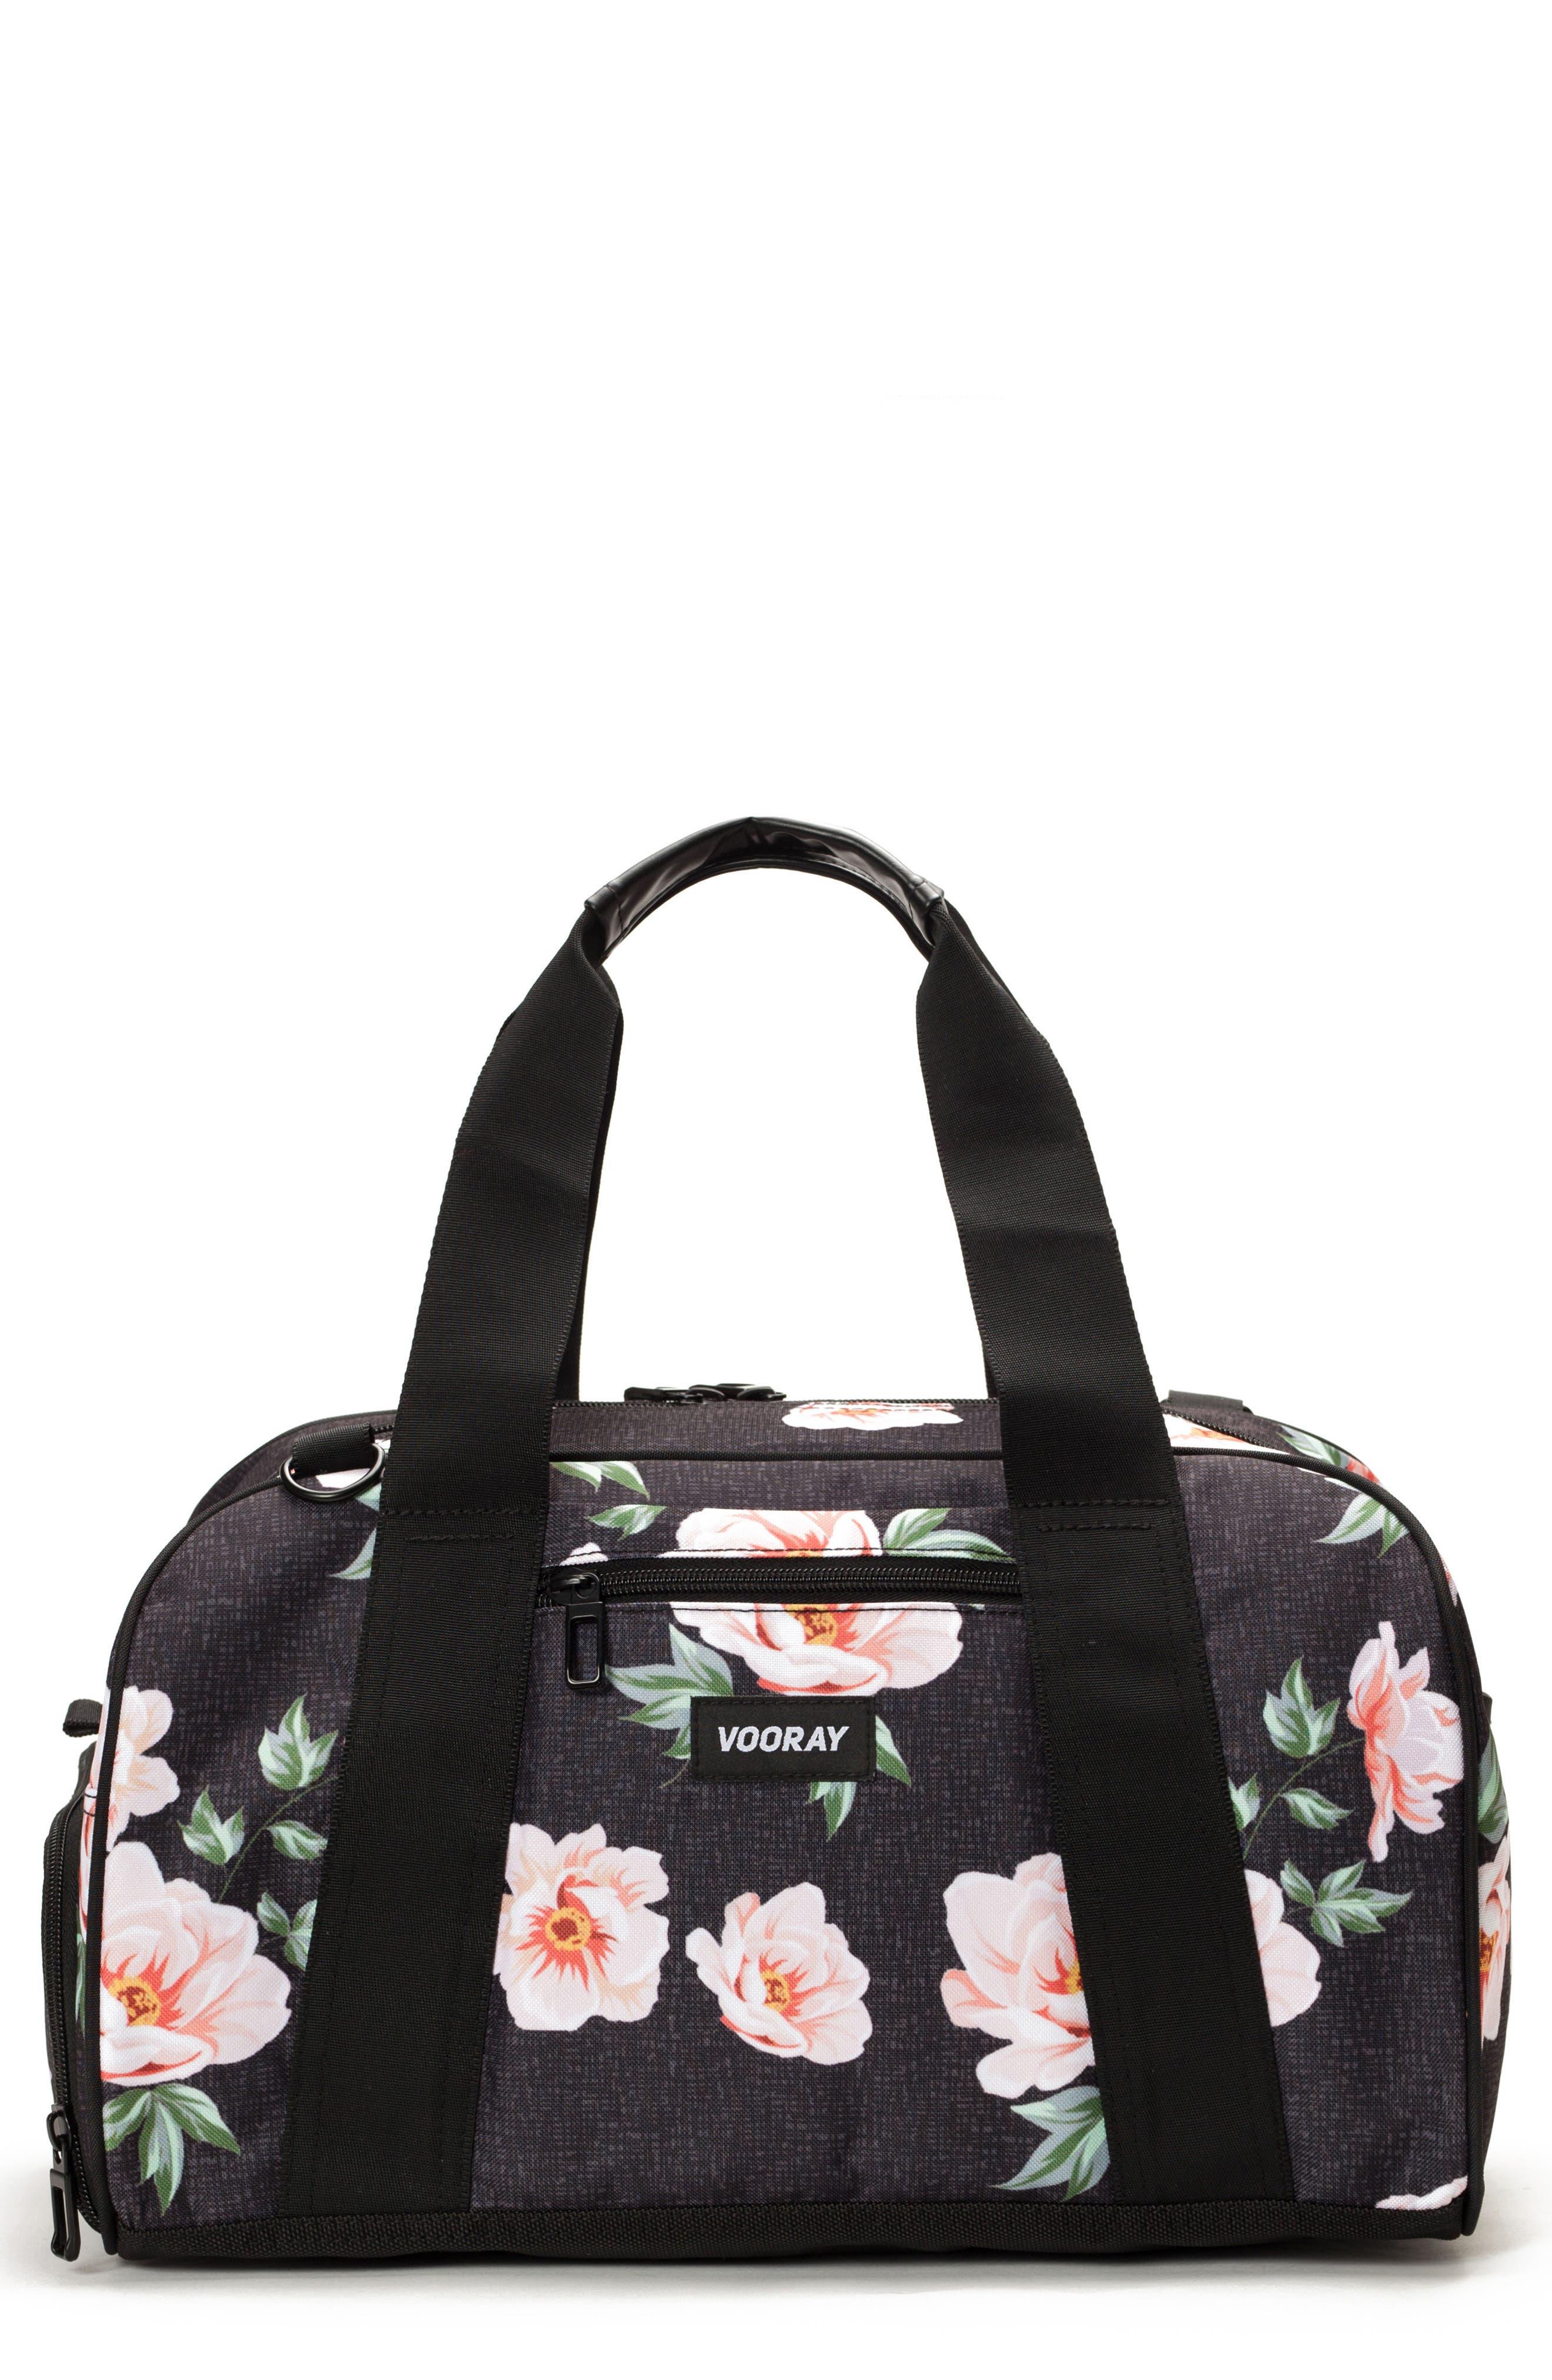 Burner Gym Bag,                             Main thumbnail 1, color,                             ROSE BLACK